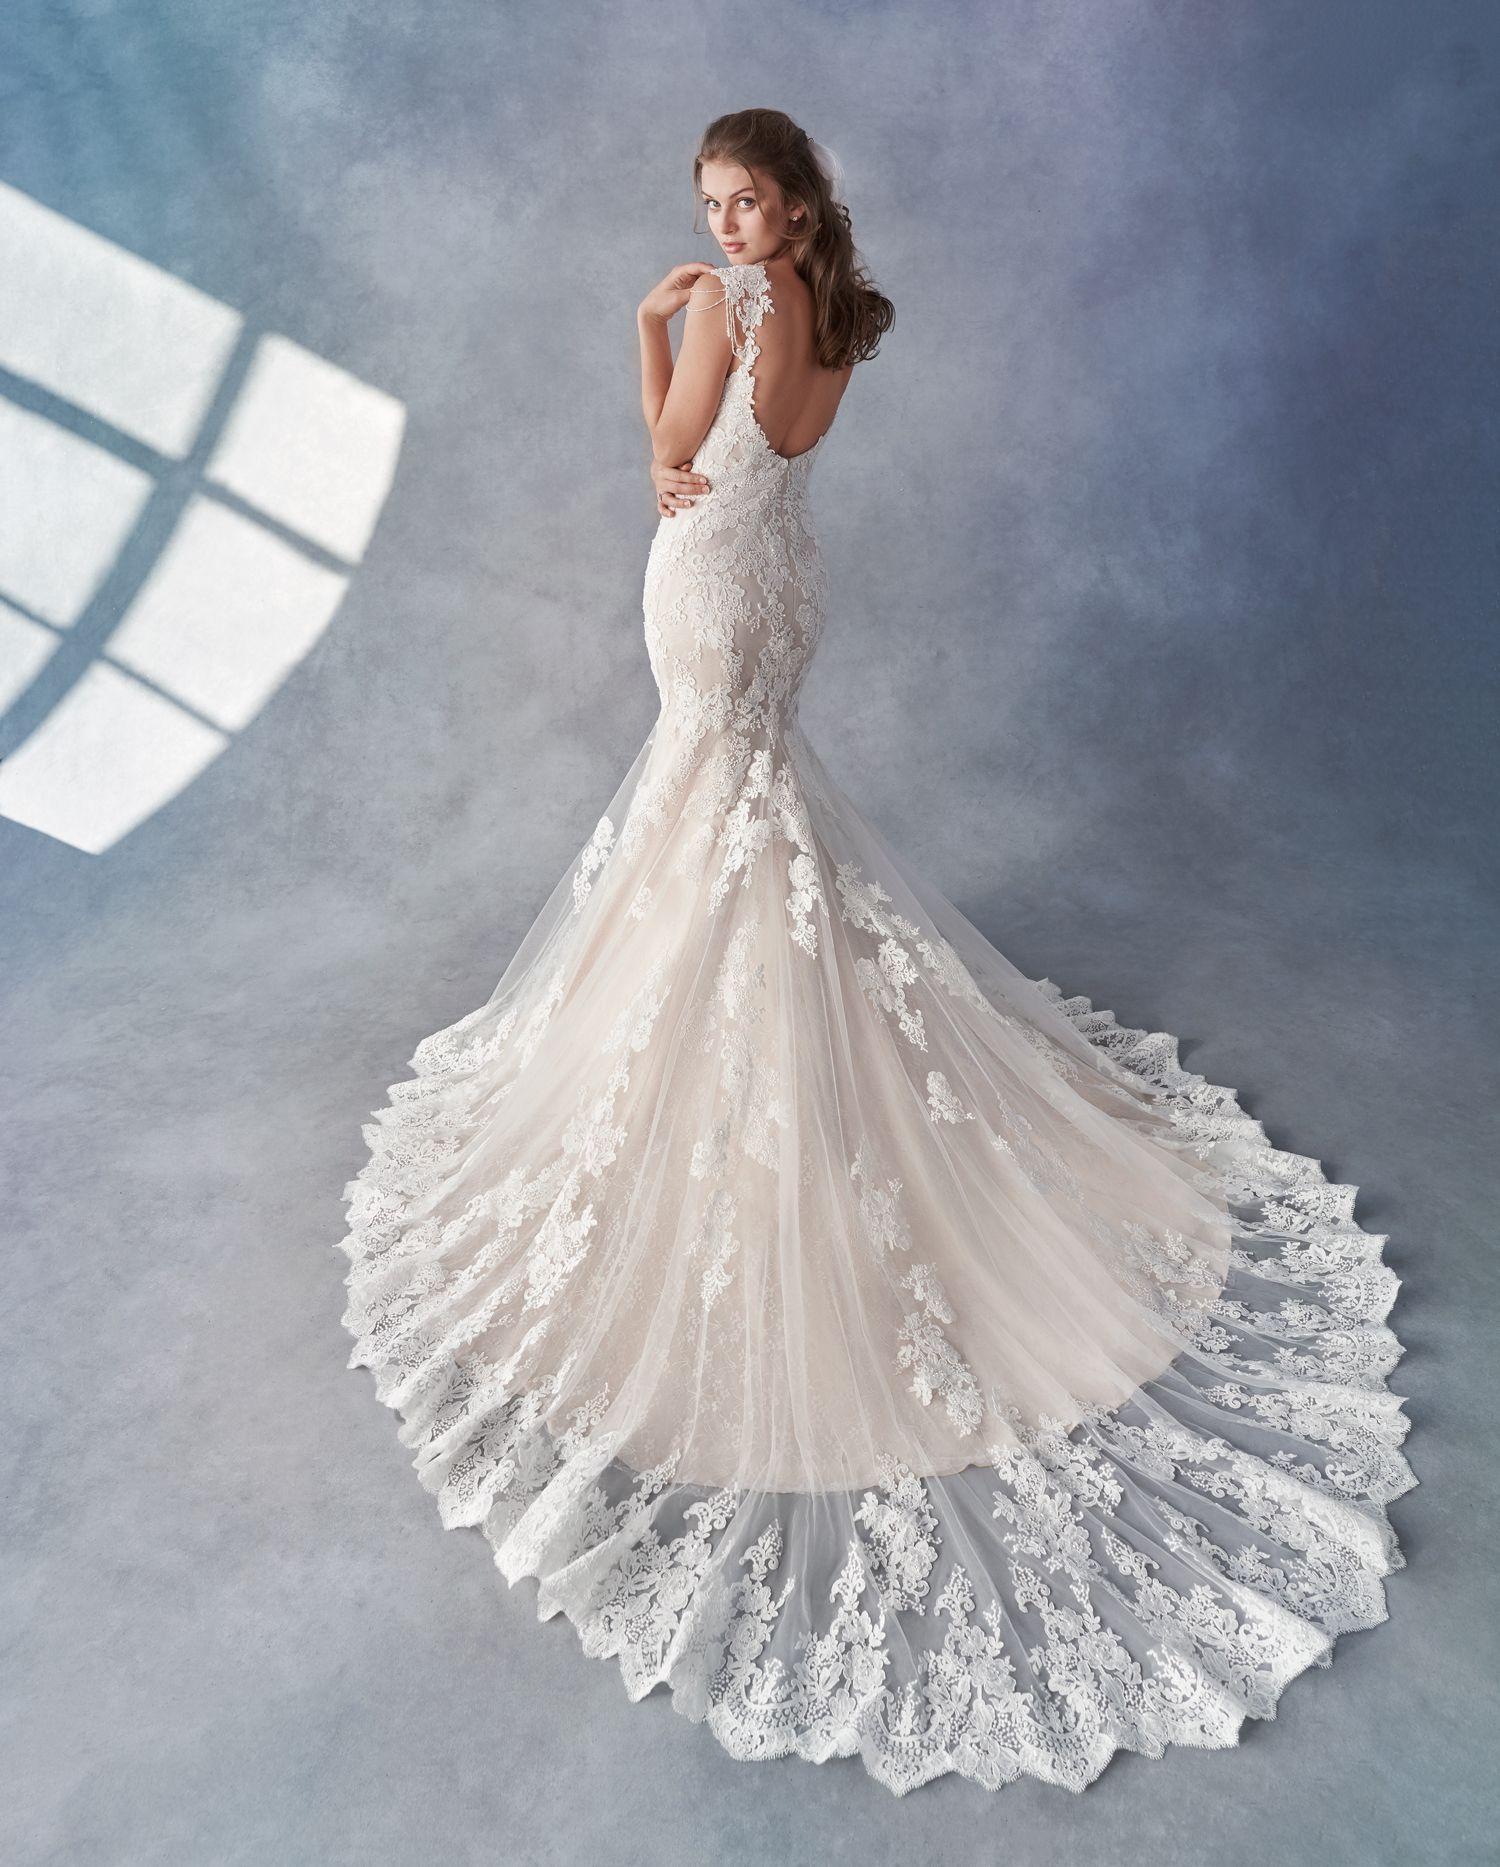 Pin On Beautiful Wedding Dresses And Bridalwear Inspiration [ 1867 x 1500 Pixel ]